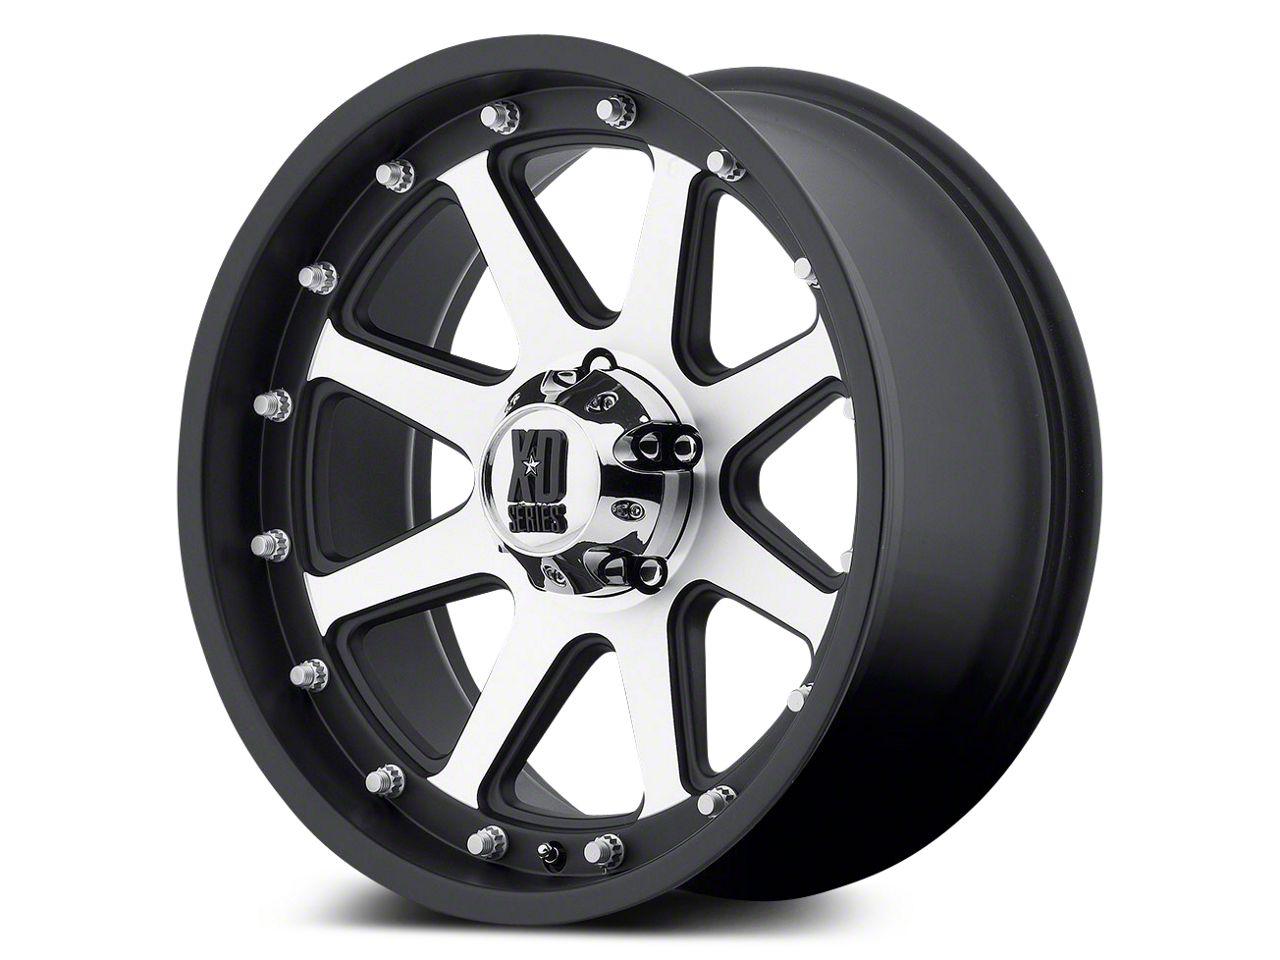 XD Addict Matte Black Machined 5-Lug Wheel - 18x9 (02-18 RAM 1500, Excluding Mega Cab)